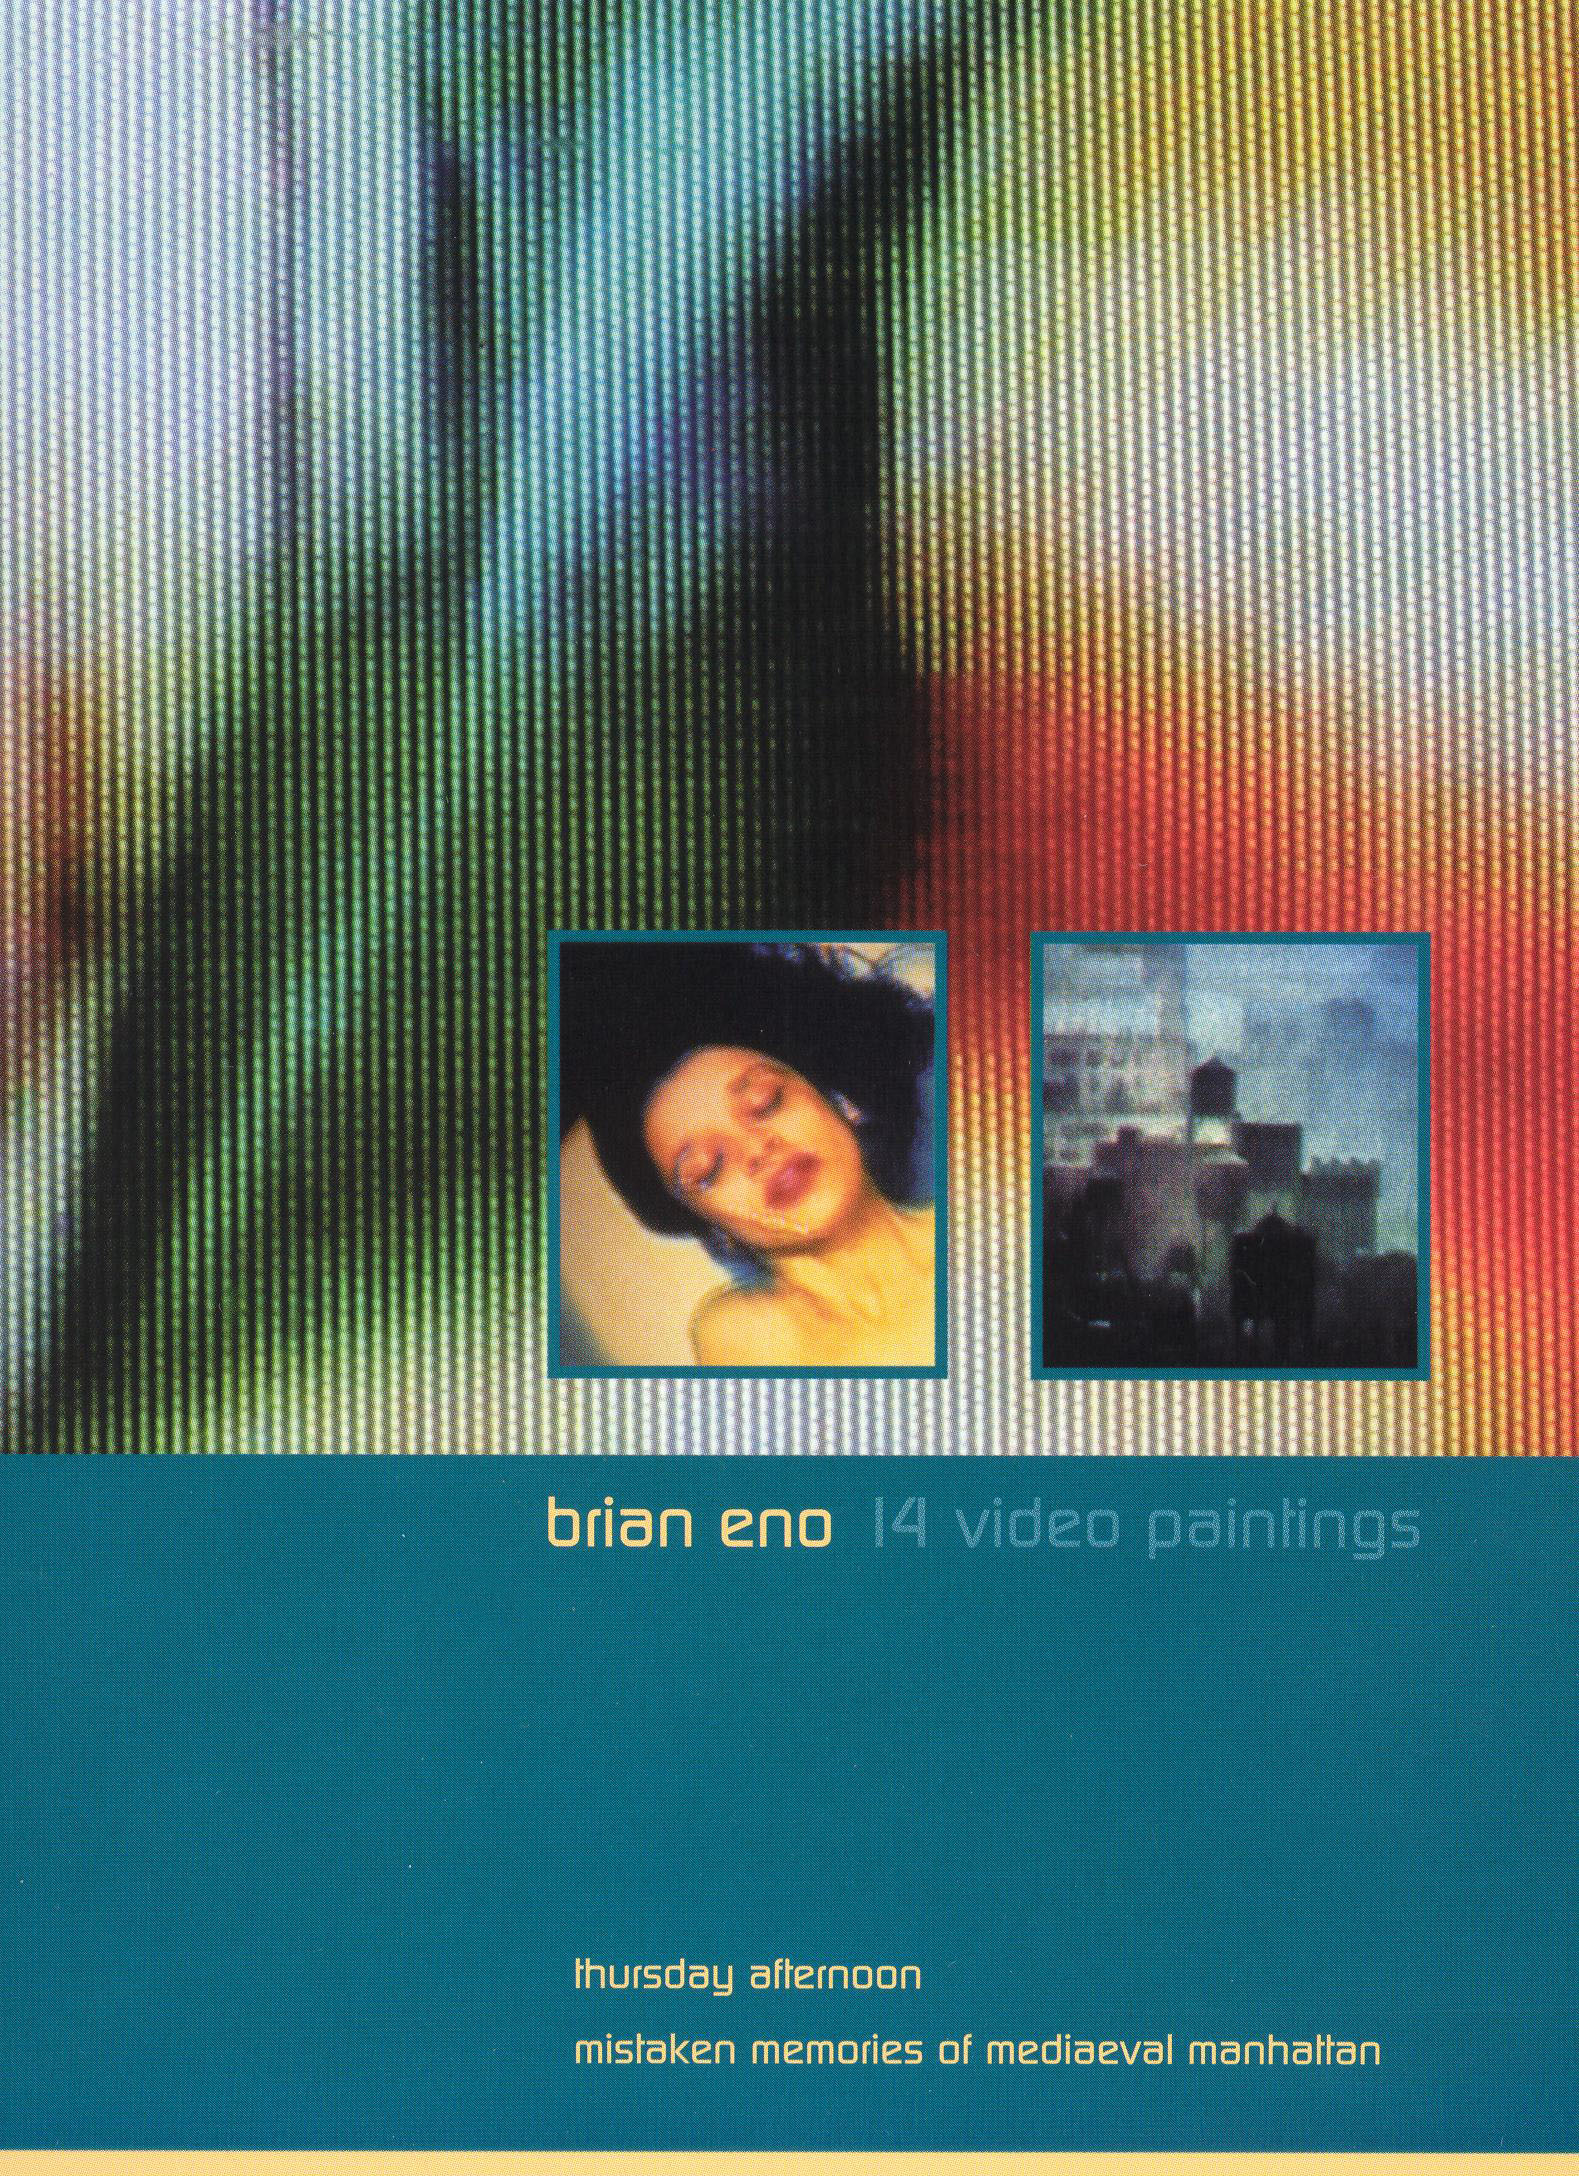 Brian Eno: 14 Video Paintings